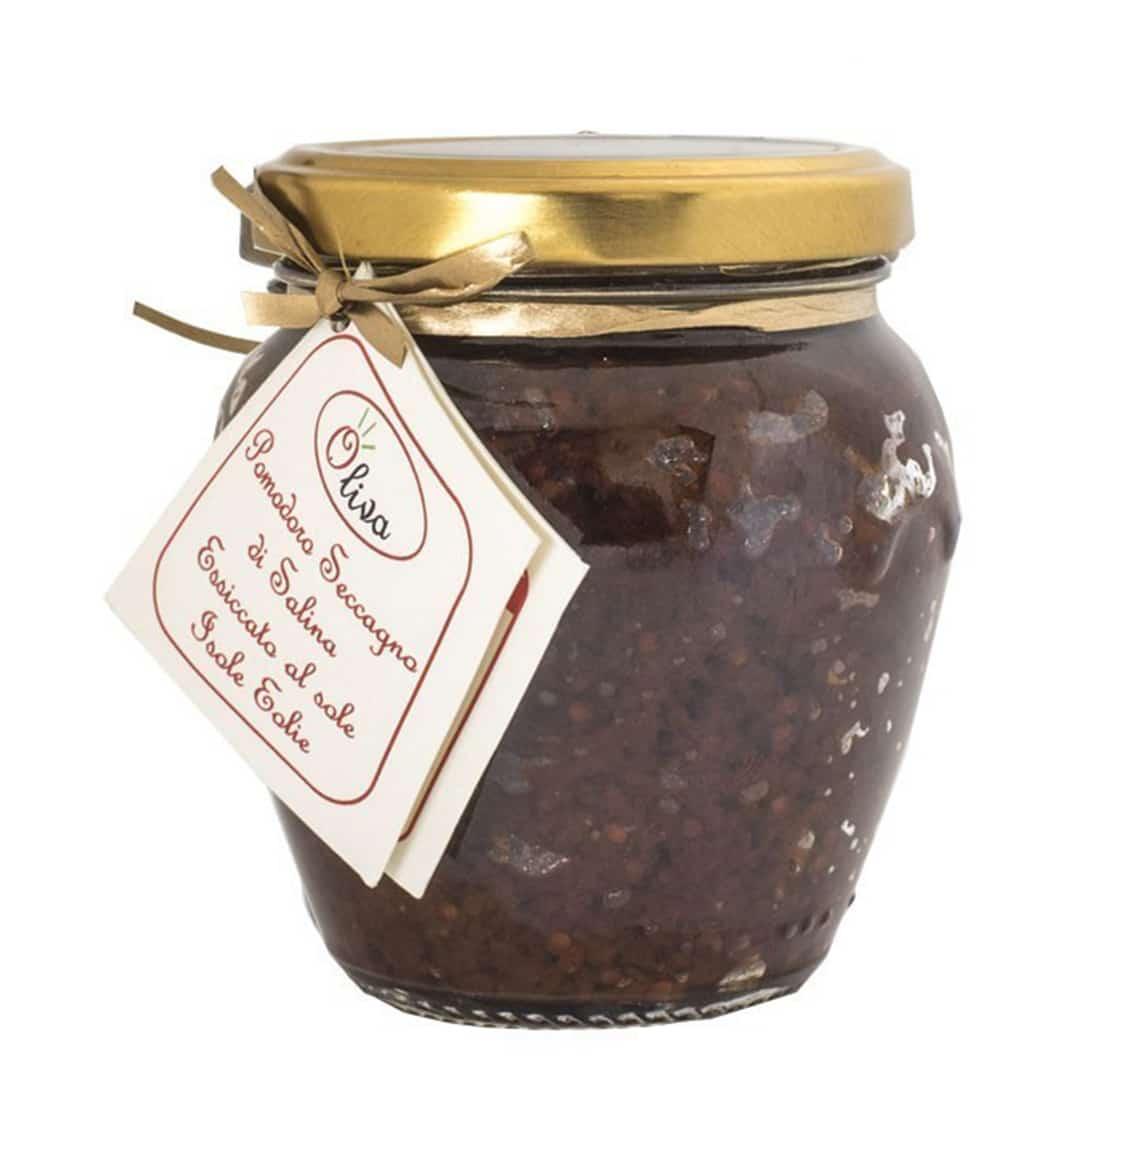 Patè di Pomodoro Siccagno di Salina 180g – Oliva